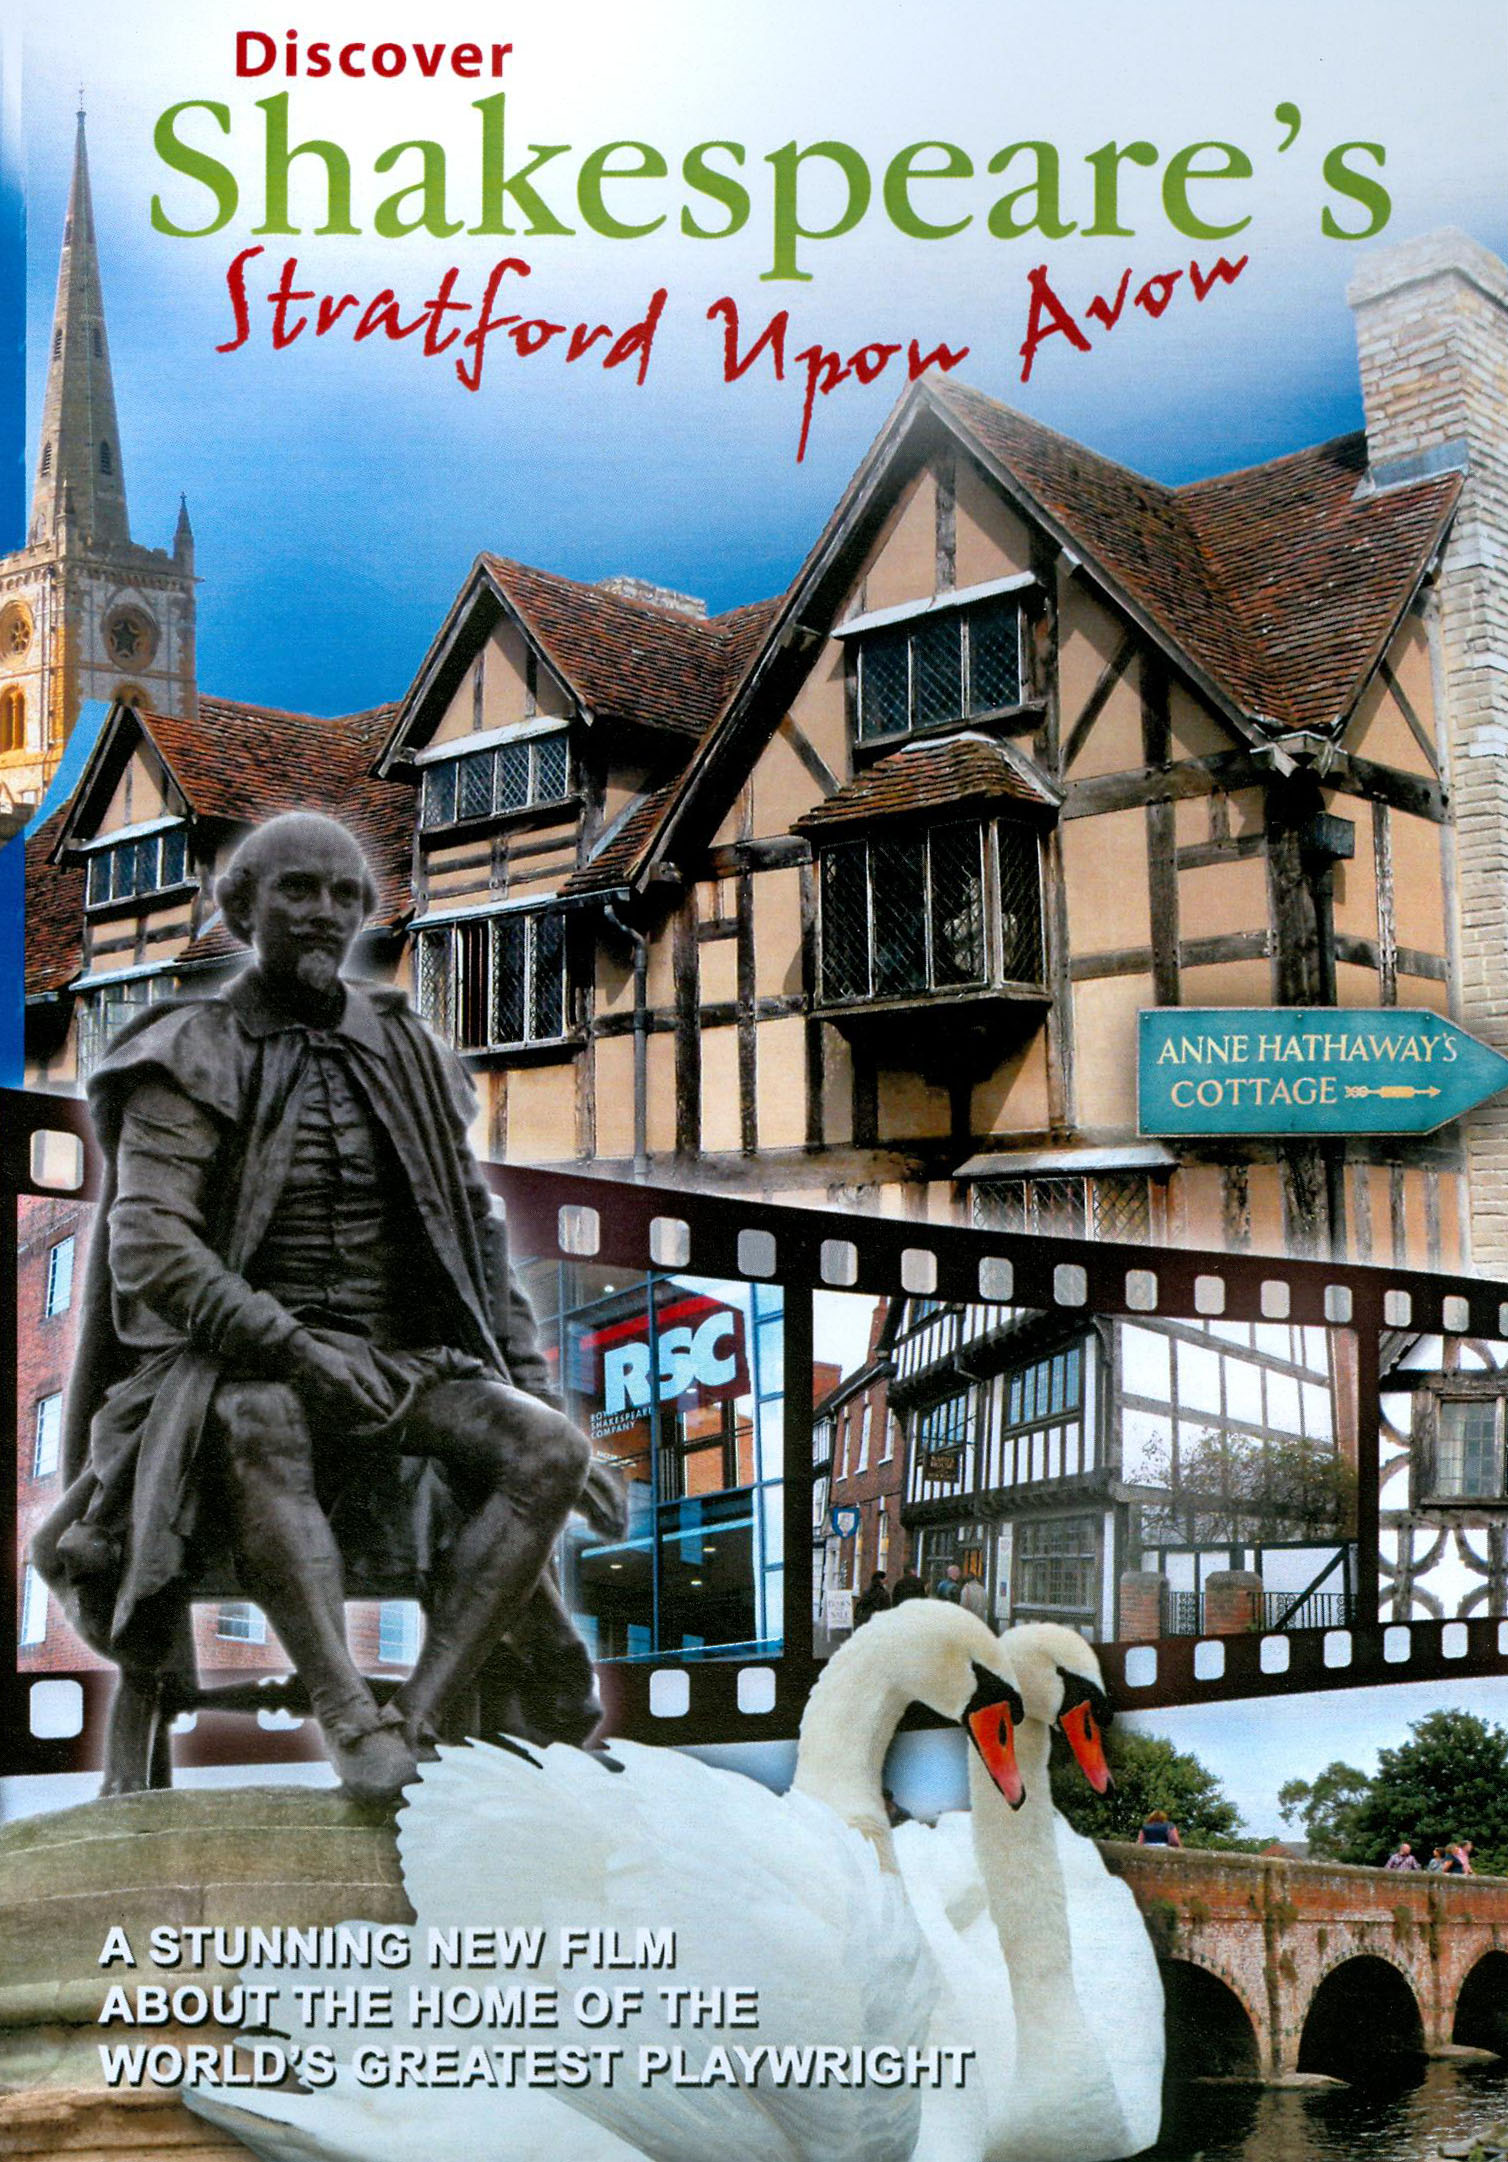 Discover Shakespeare's Stratford Upon Avon